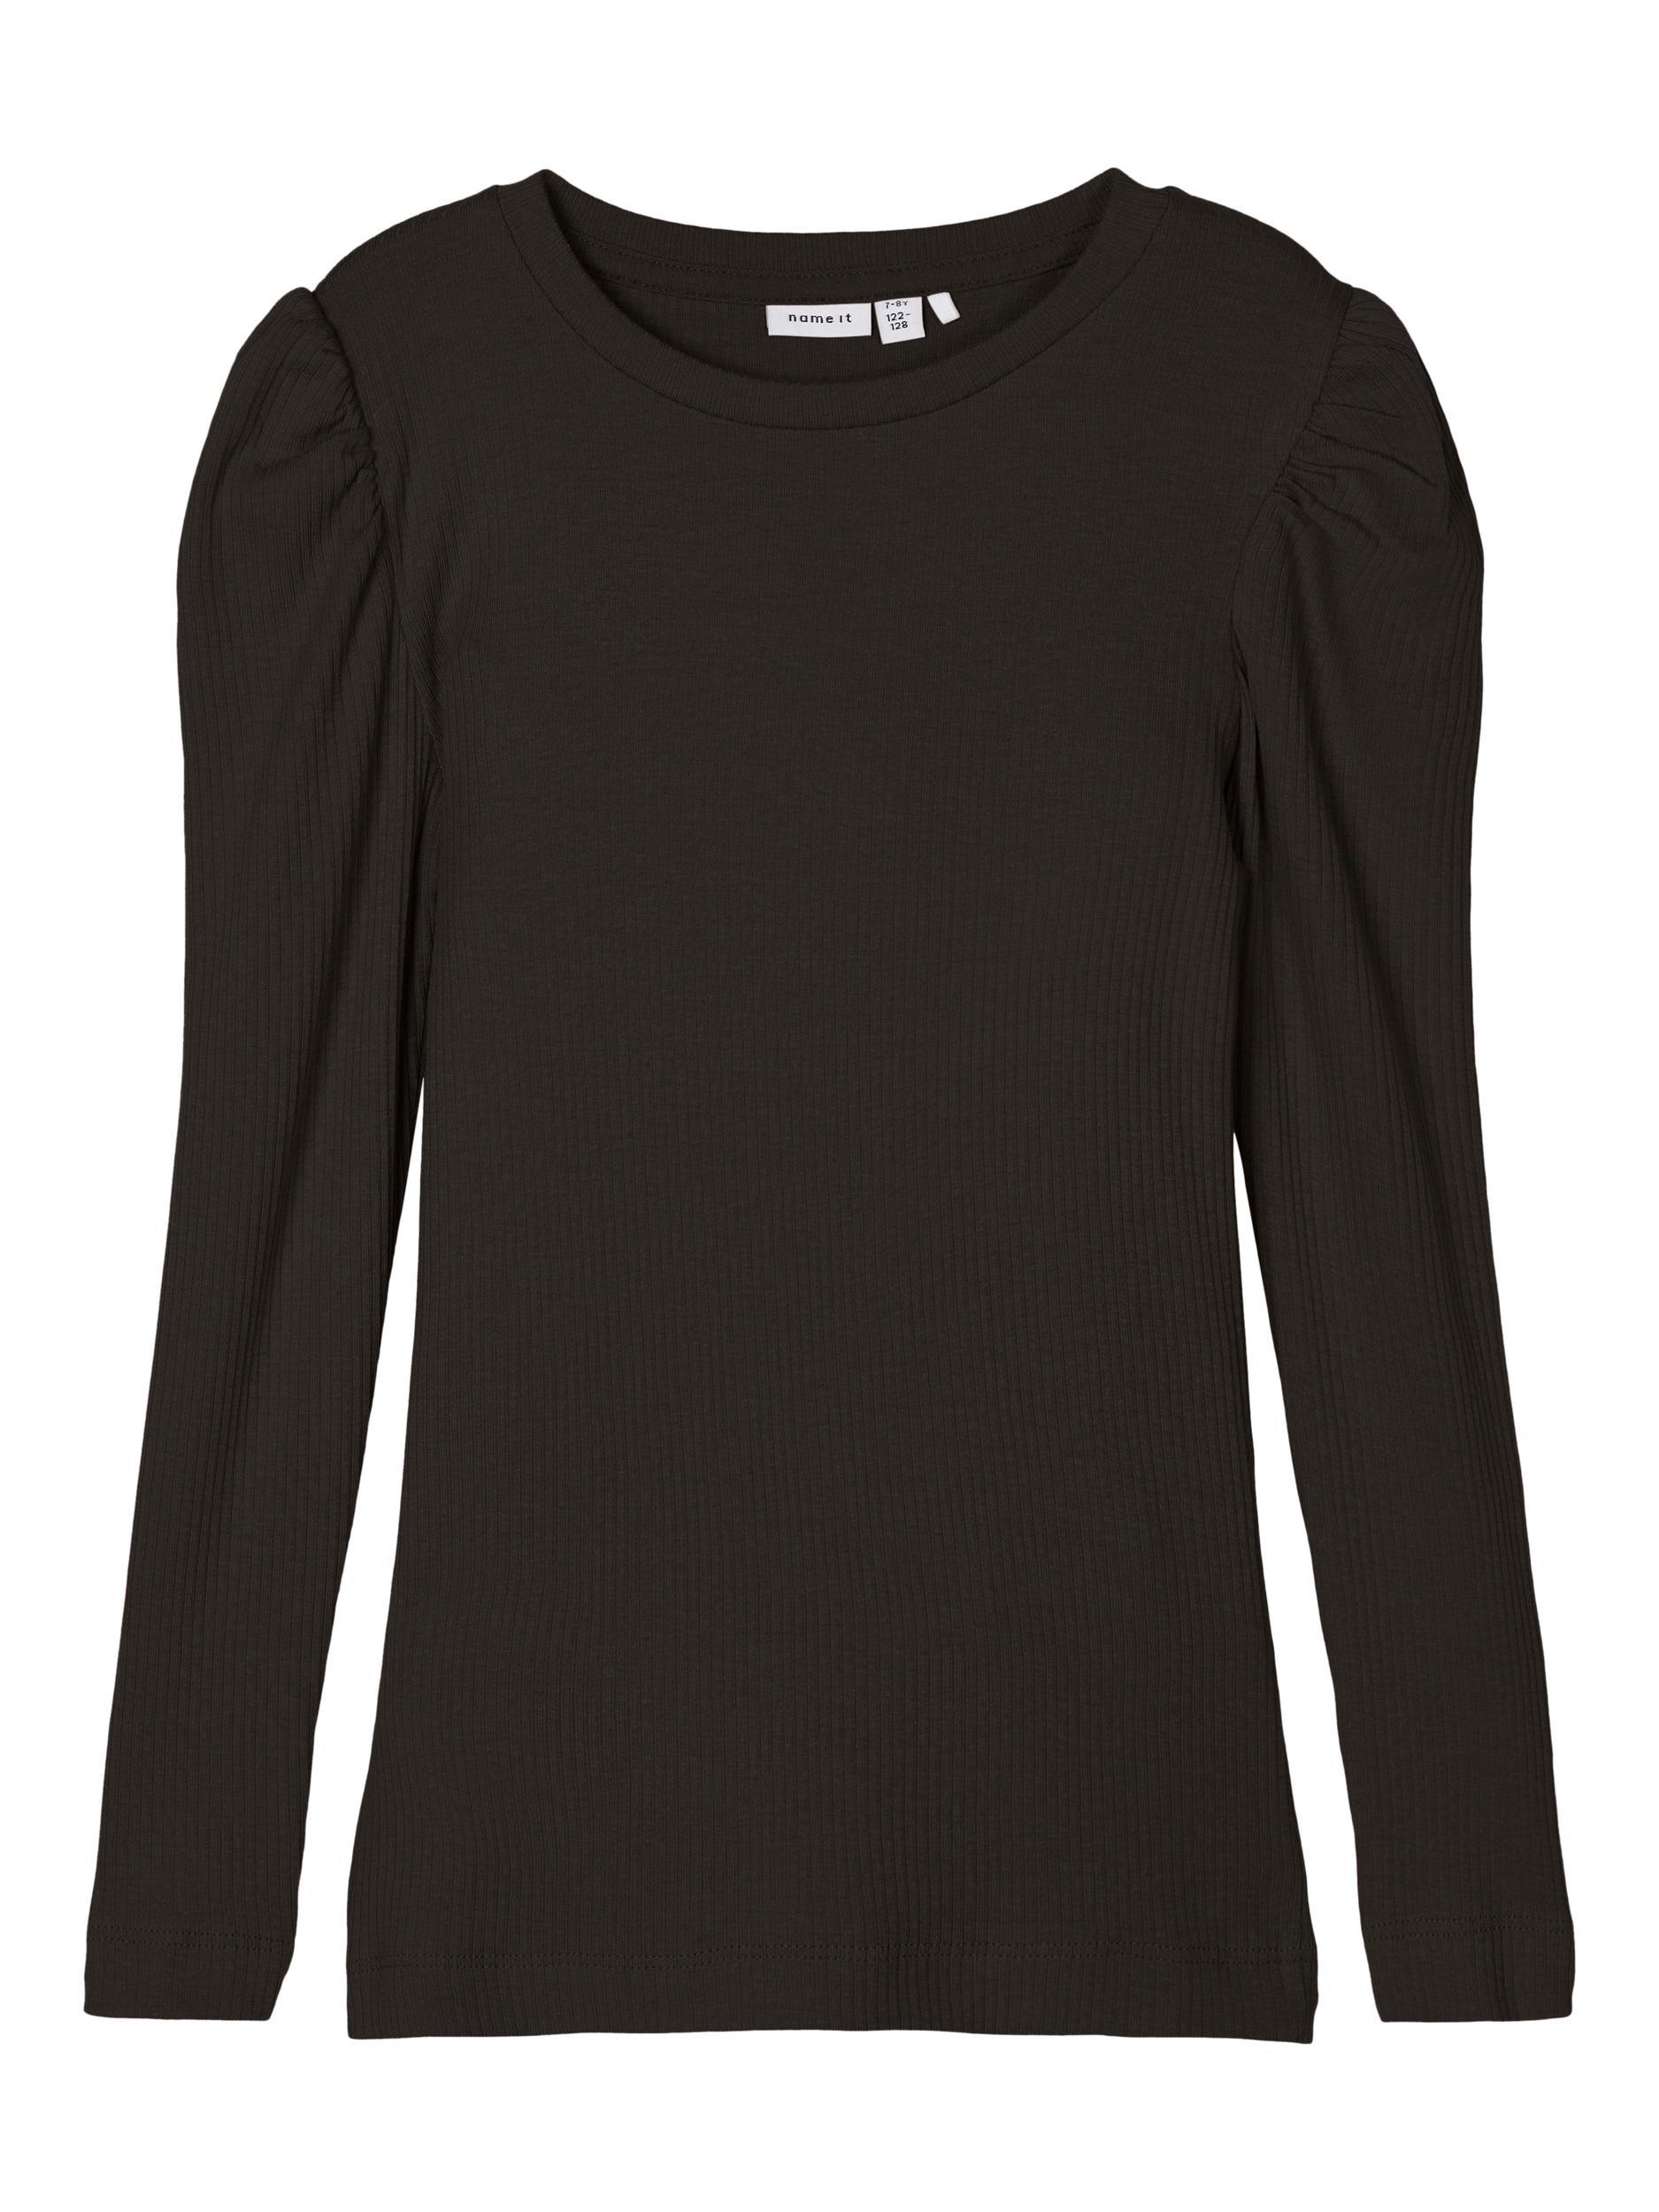 Name It Kabexi LS bluse, black, 146-152